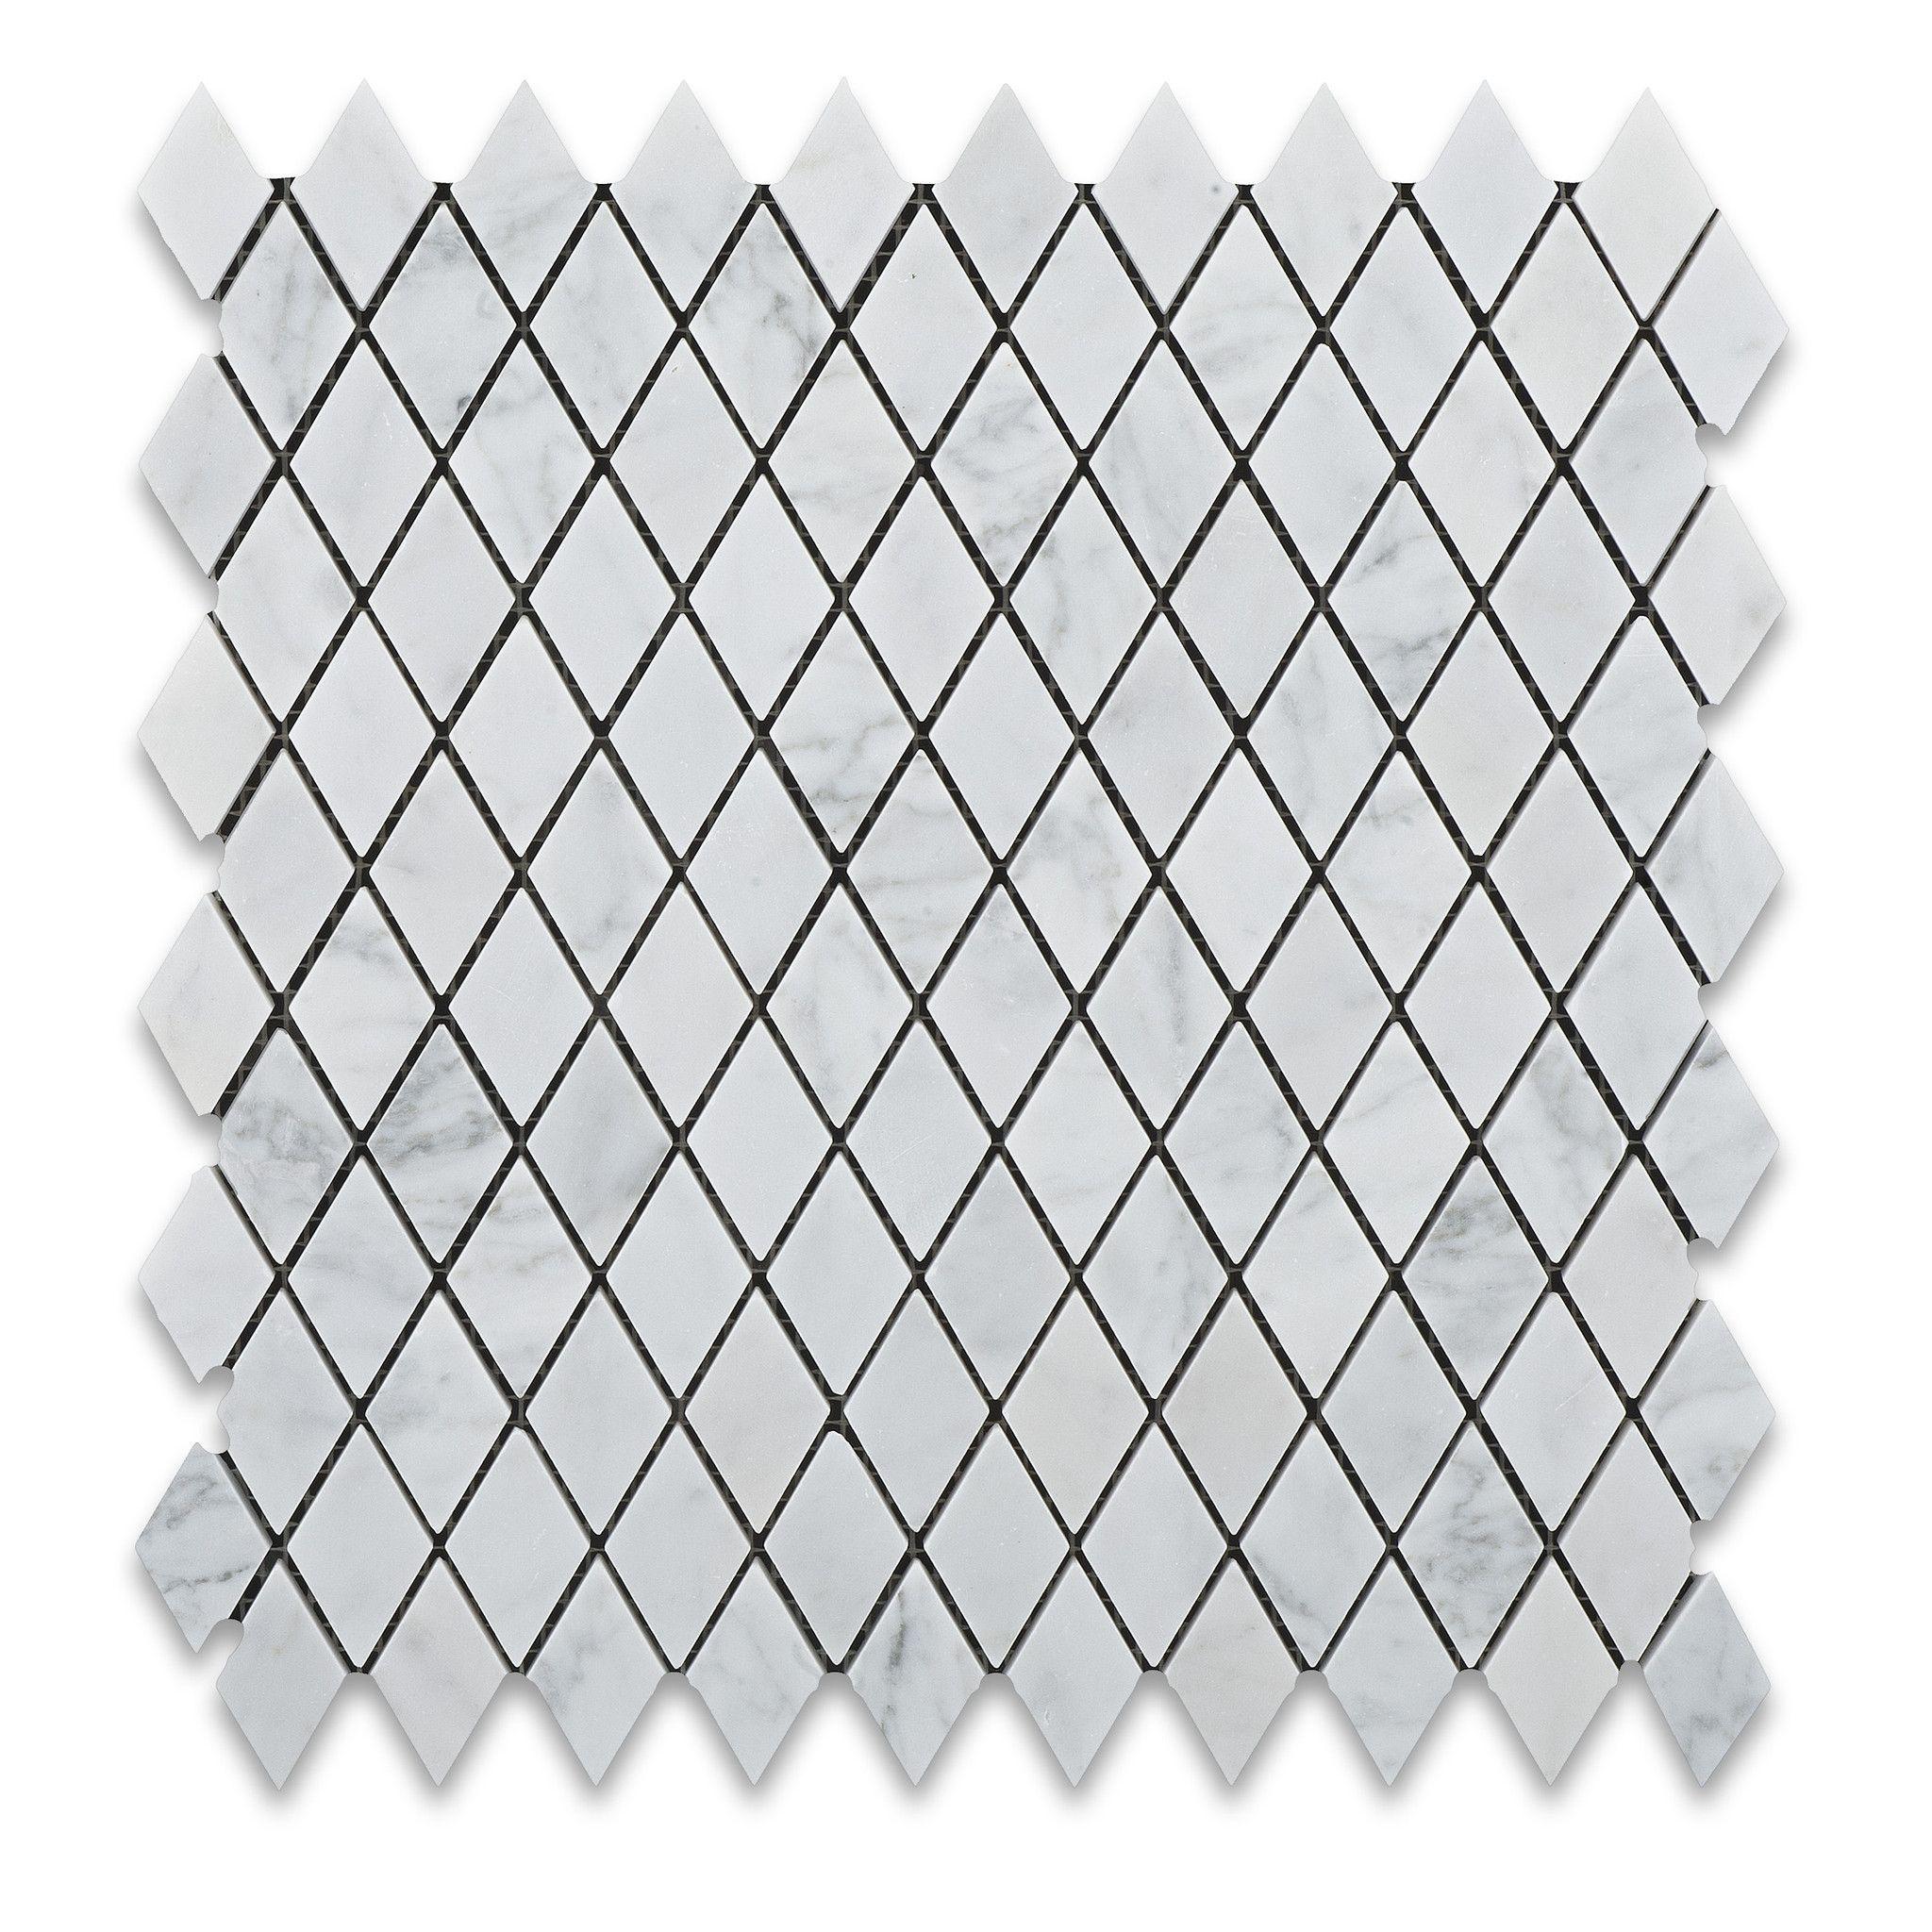 "Buy Carrara White Marble Honed 1"" Diamond Mosaic Tile Sample Product Attributes - Item: Premium (SELECT) Quality 1"" Italian Carrara White Marble DIAMOND / RHOMBOID HONED MOSAIC TILE (ON-MESH) - Dimens"